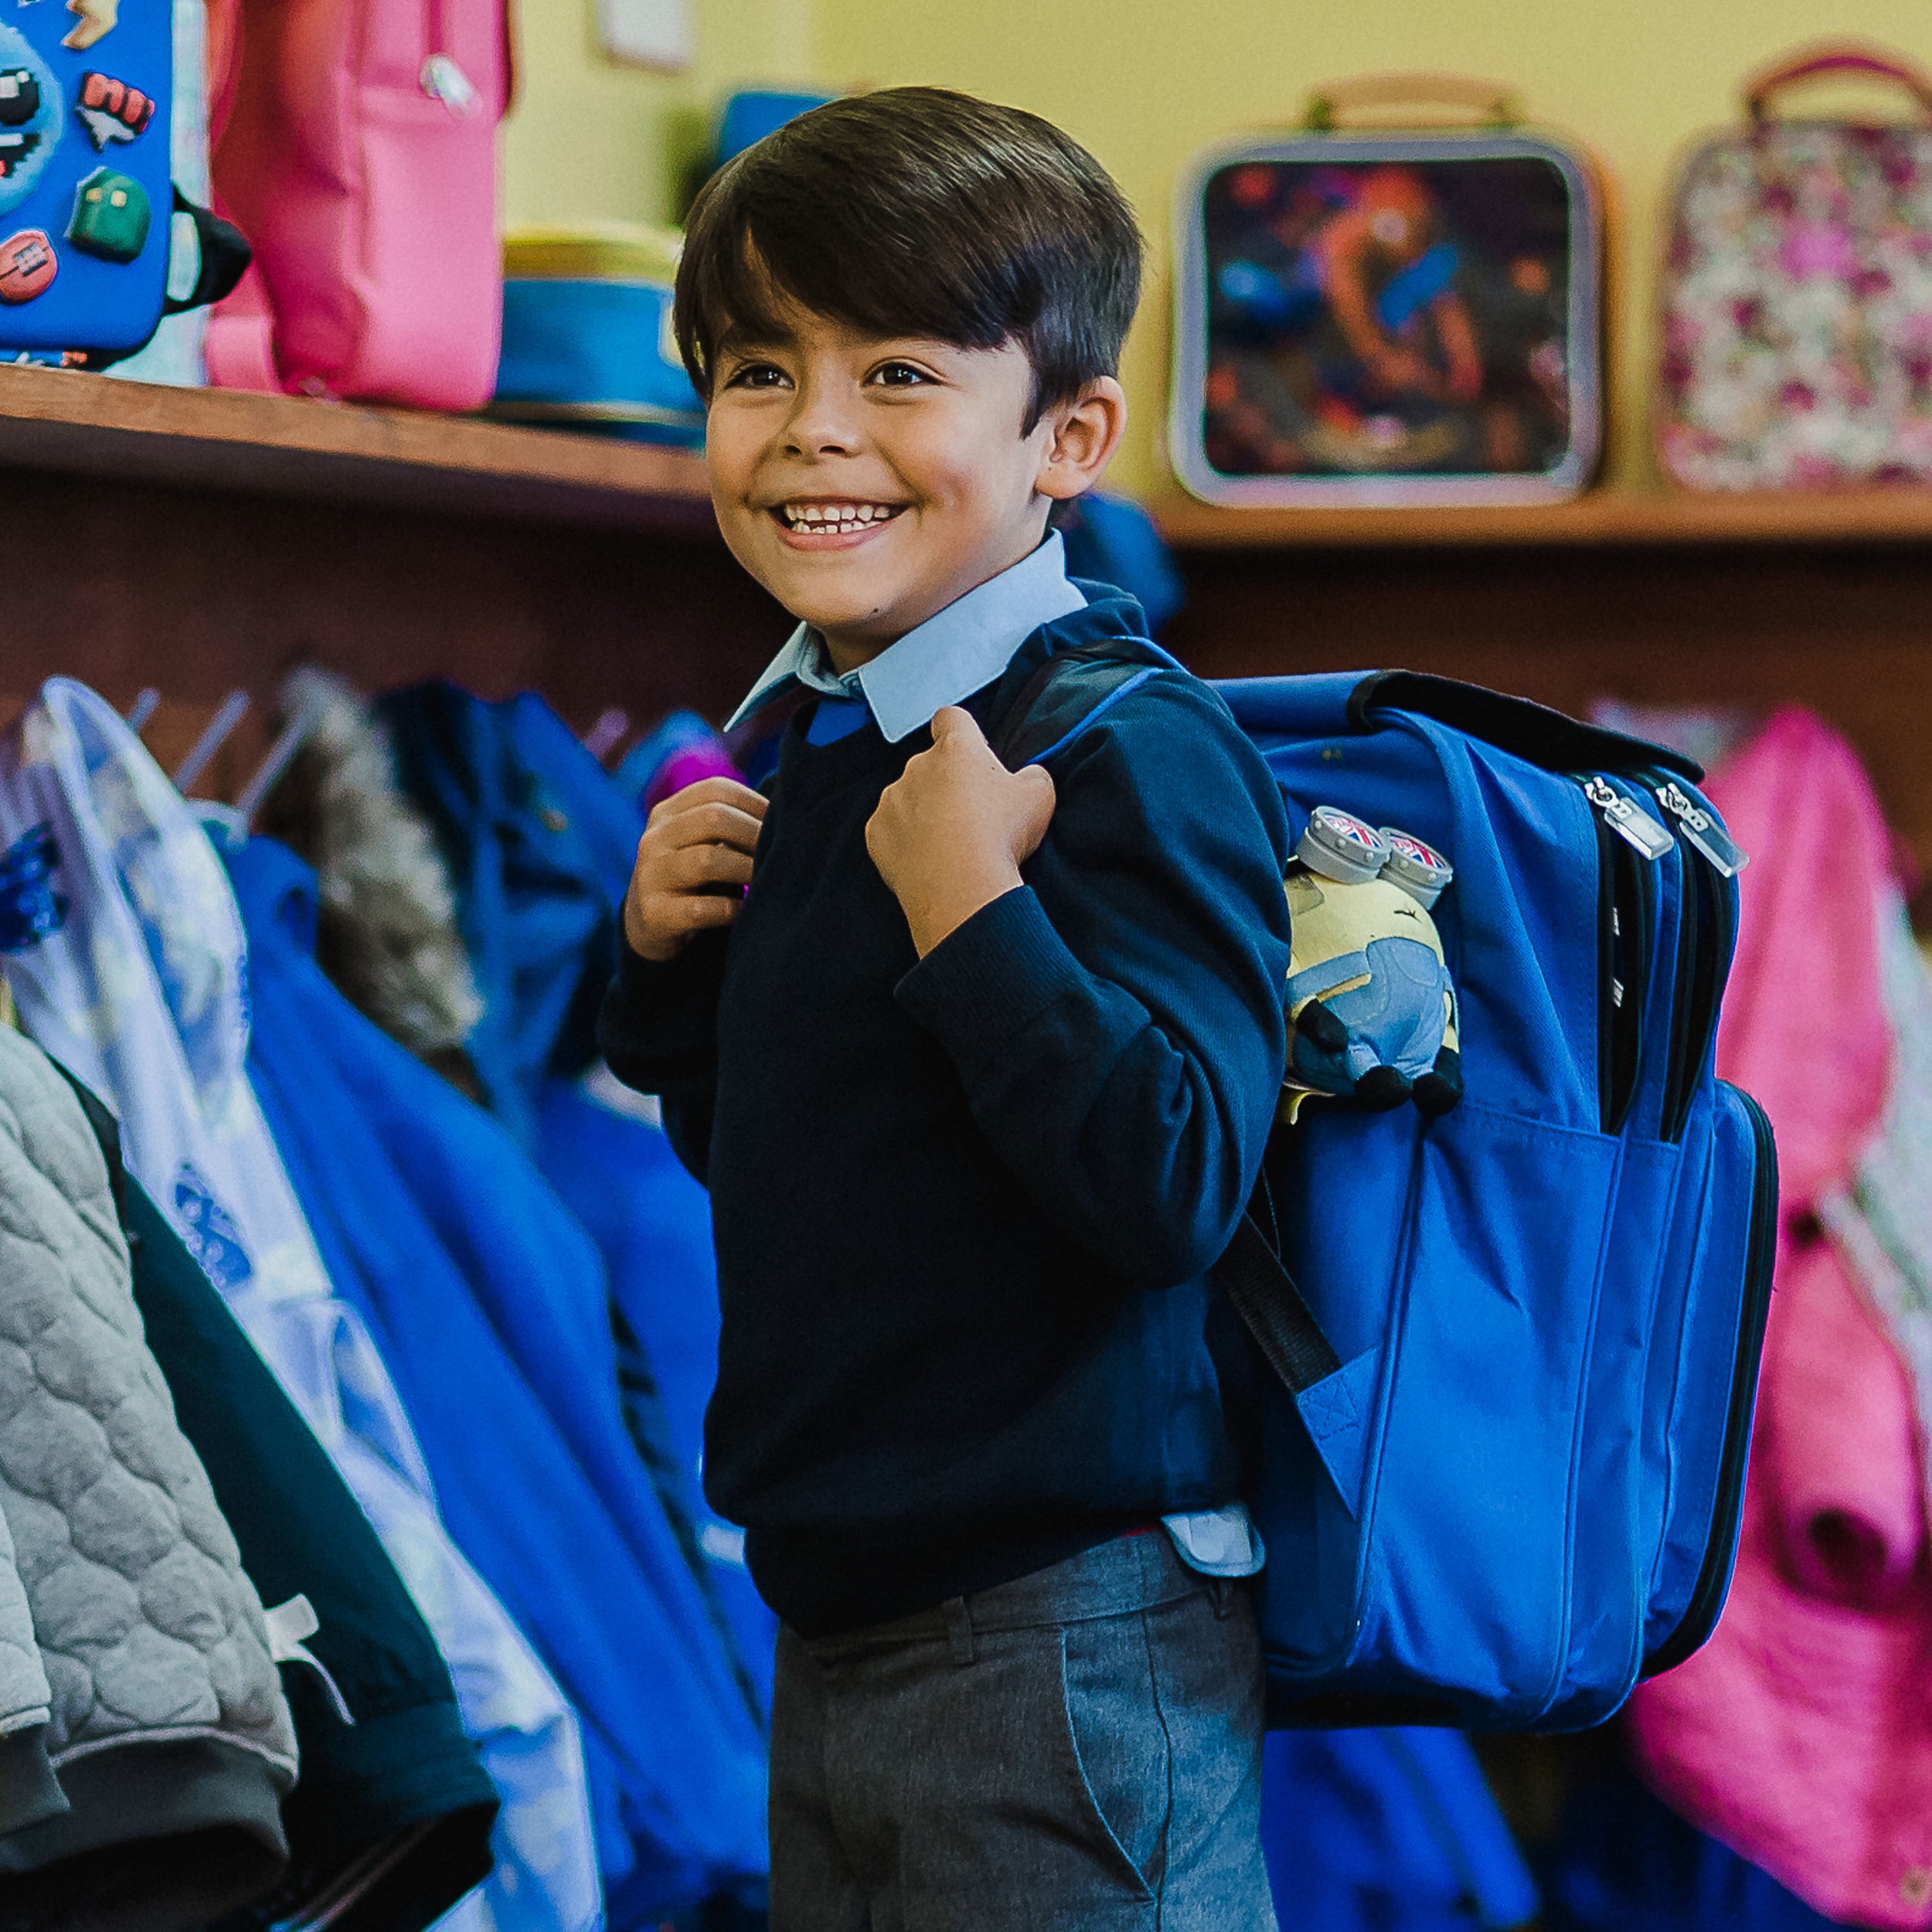 Hessle-Mount-Primary-boys-uniform.jpg